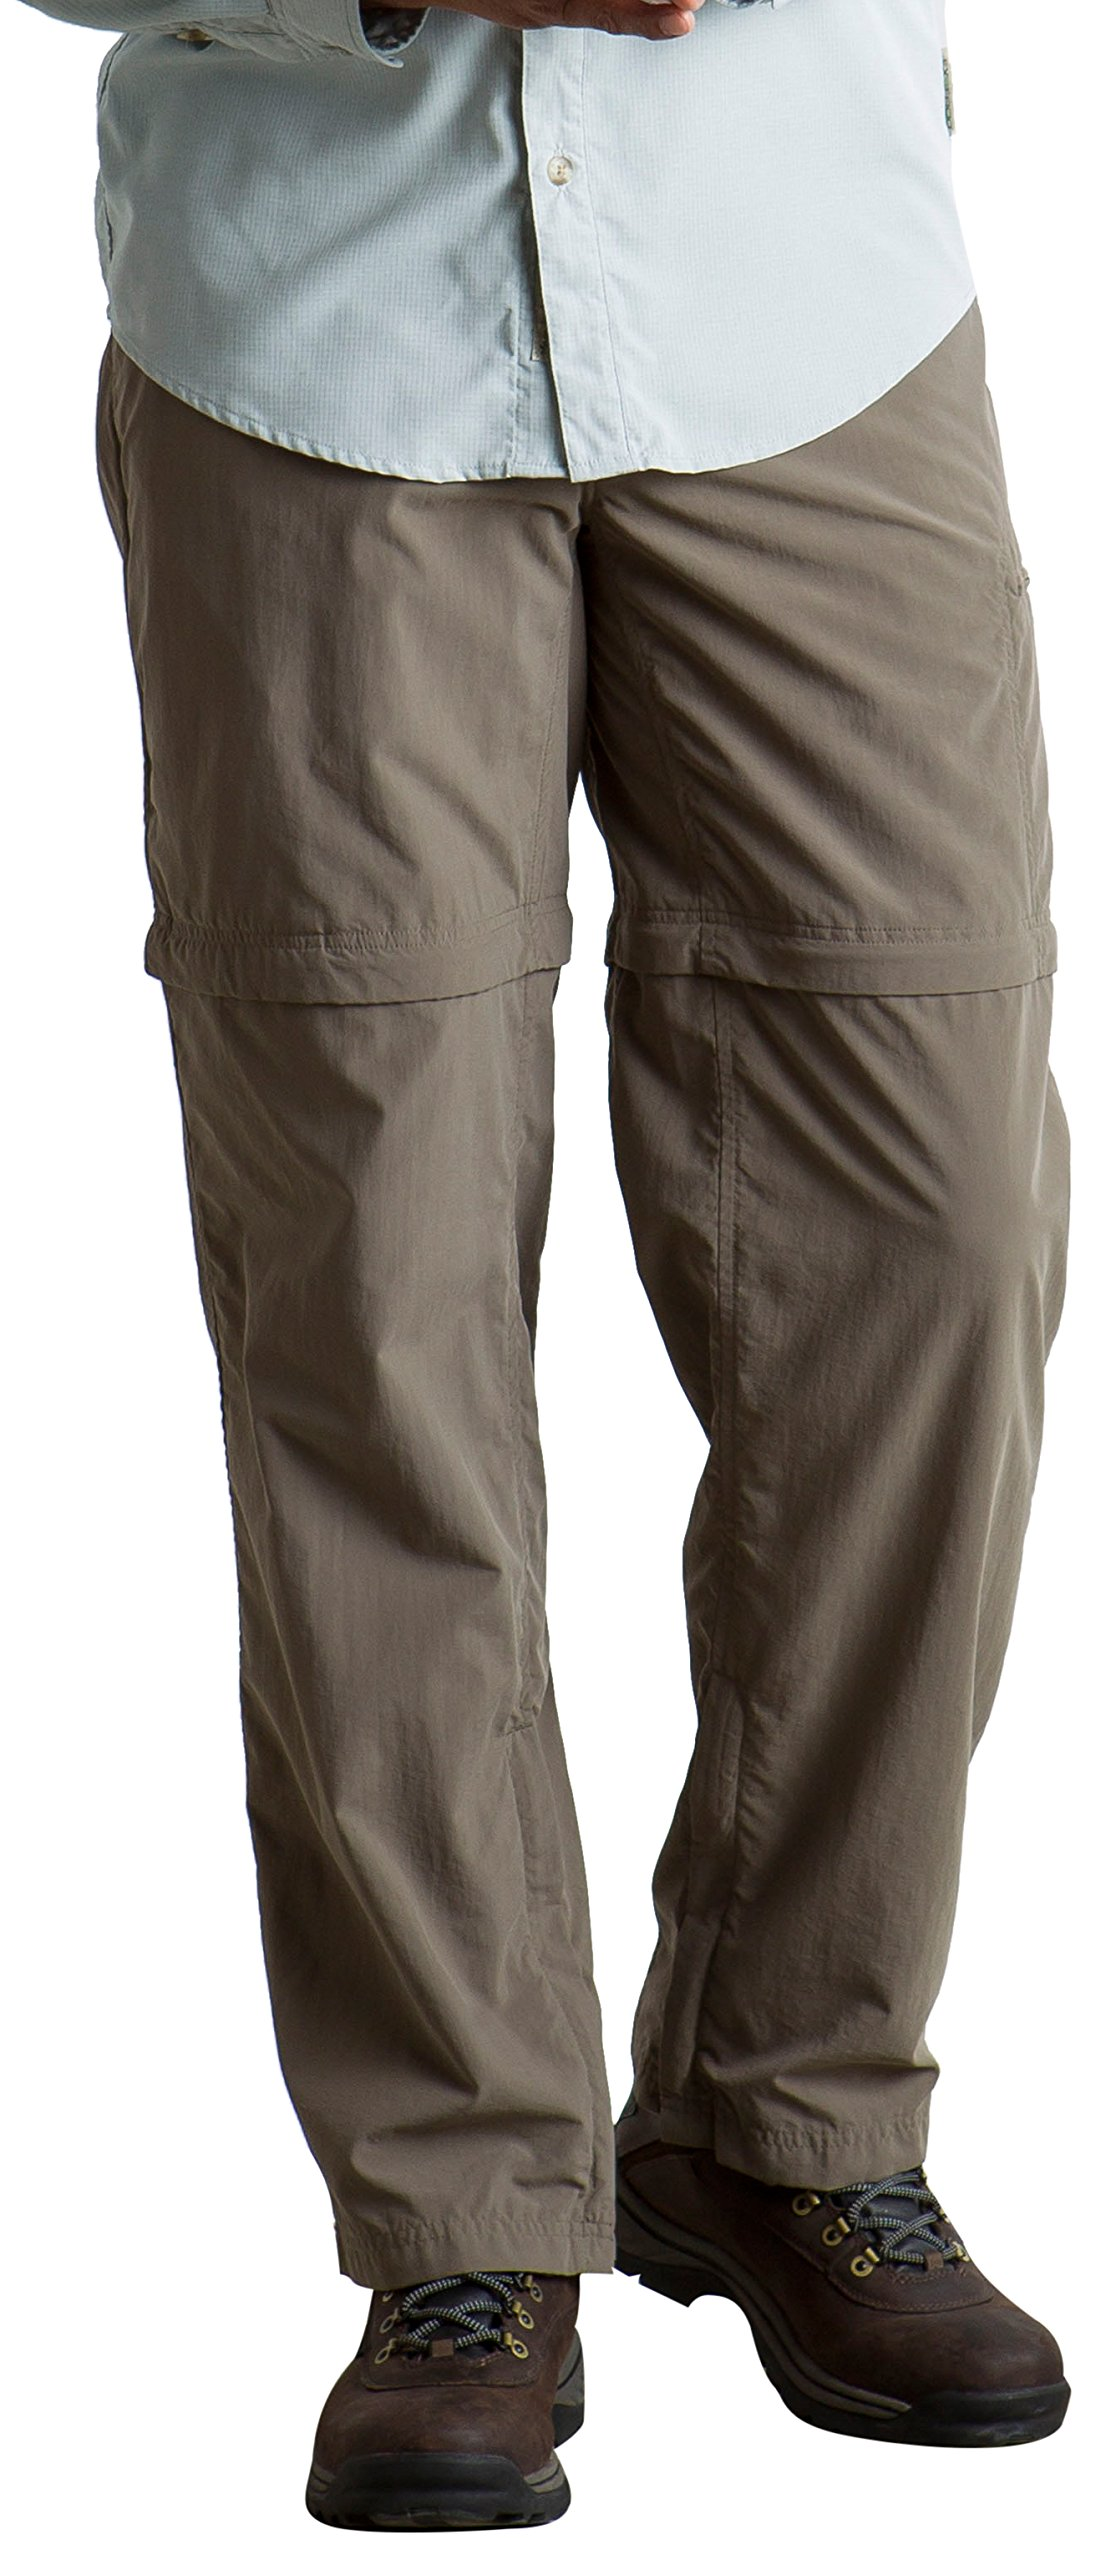 ExOfficio Men's BugsAway Sol Cool Ampario Convertible Hiking Pants